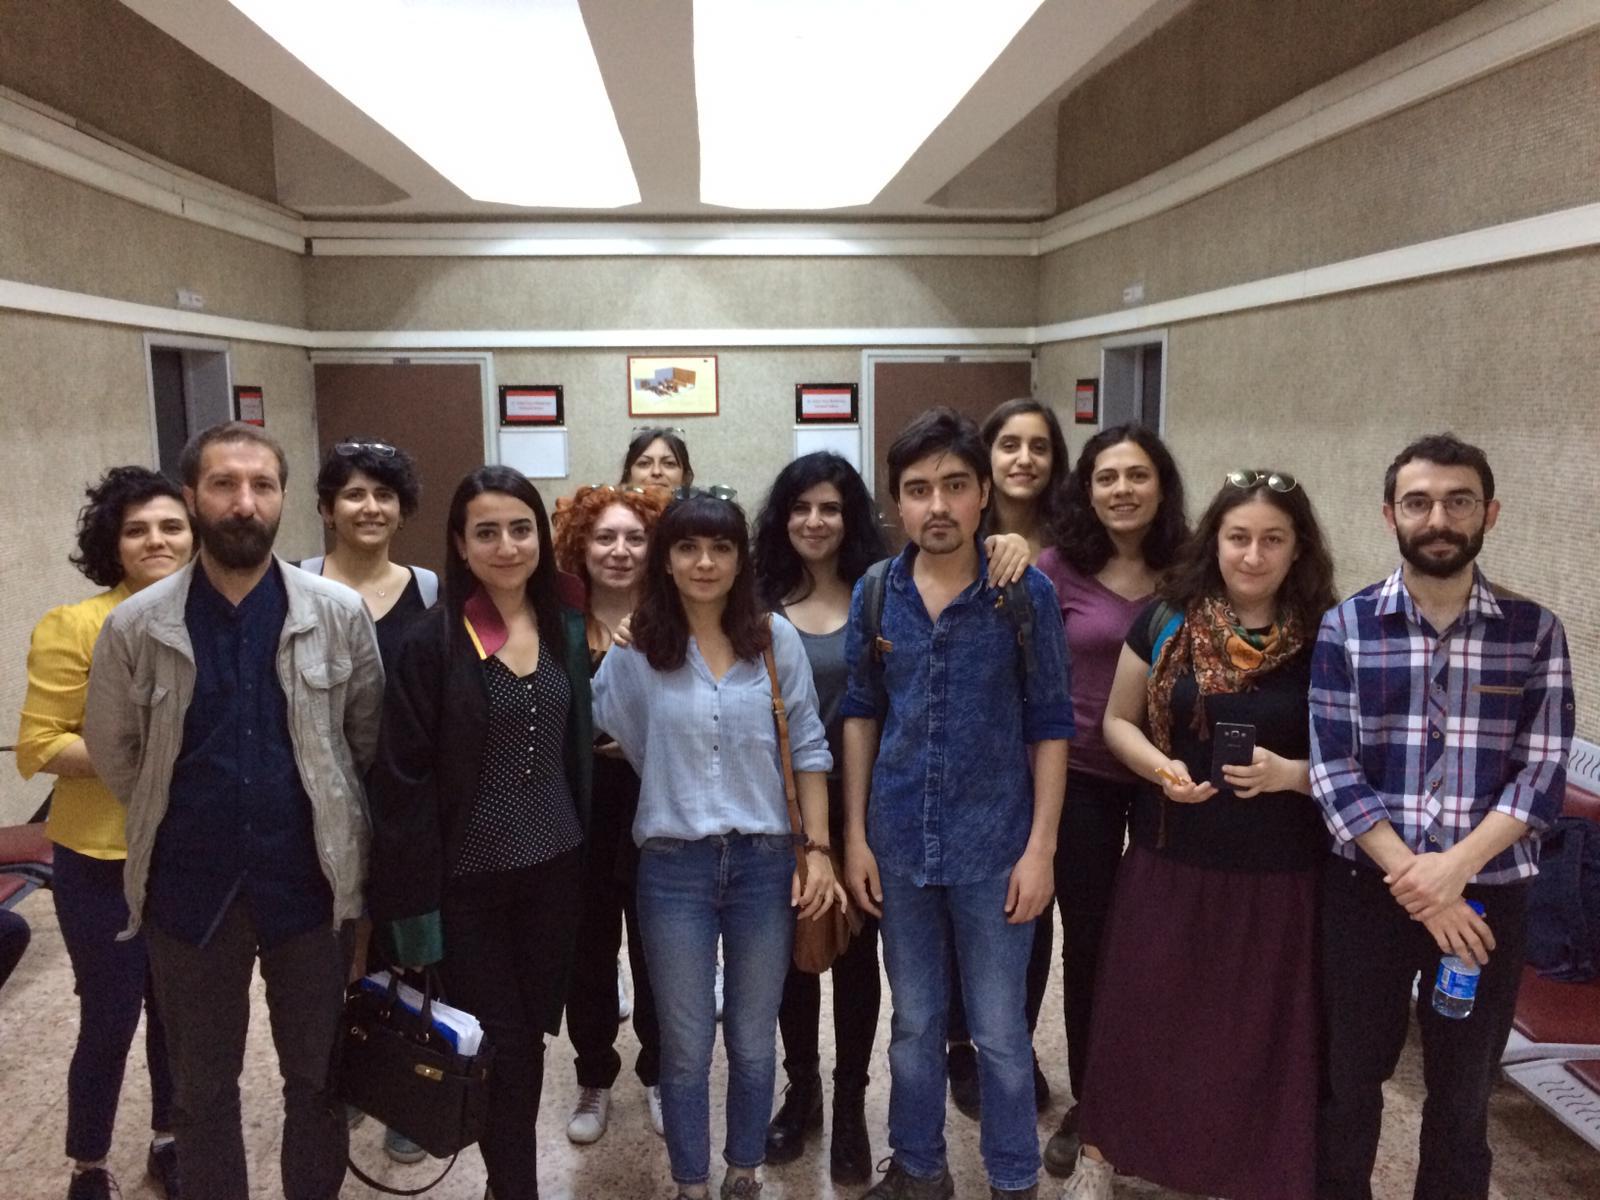 Court overturns judgment in Seda Taşkın's case